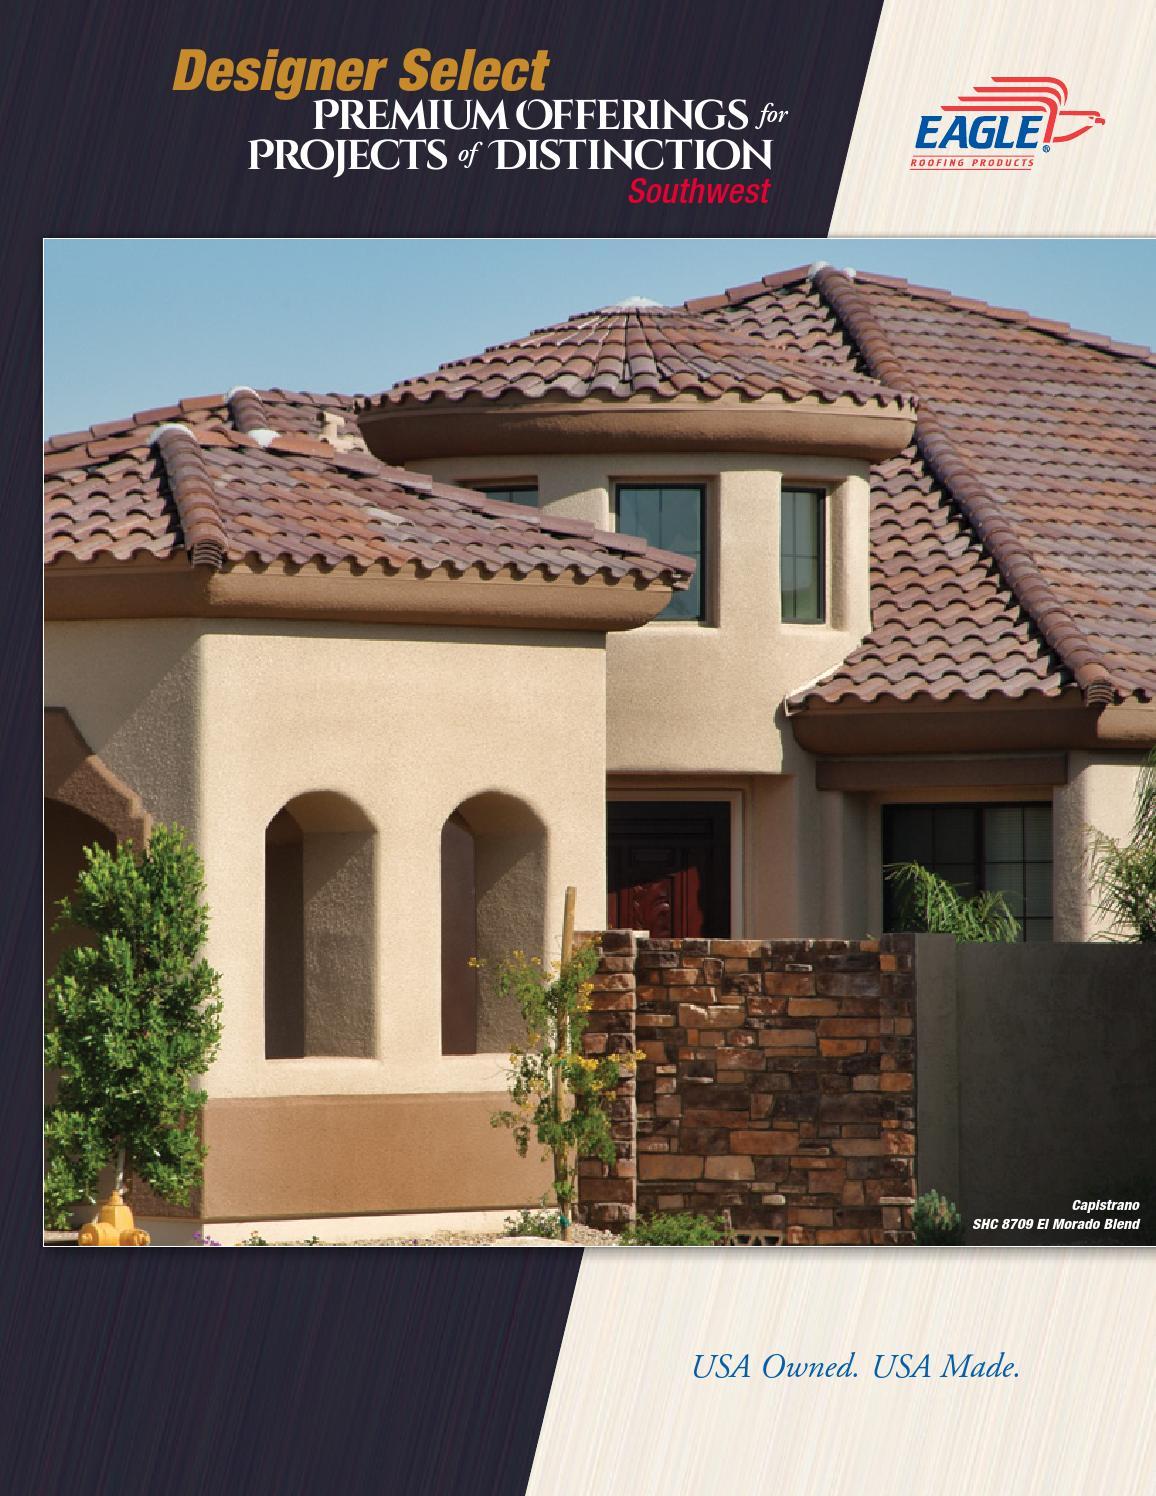 Eagle Southwest Designer Select Premium Collection 2013 By